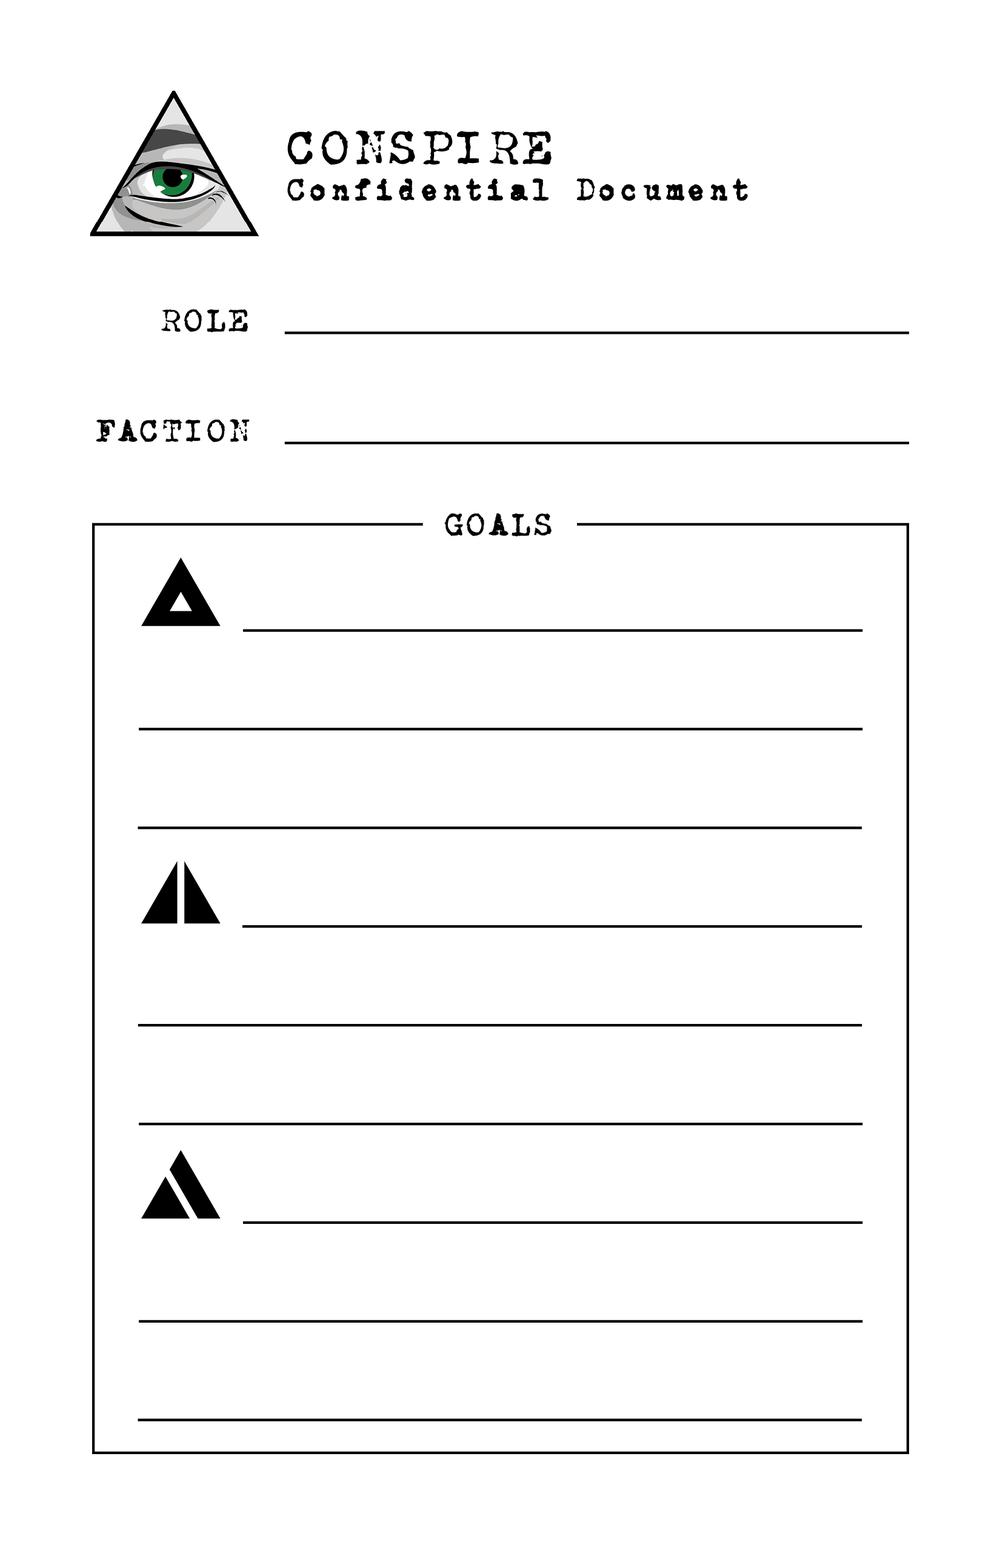 Role Sheet -